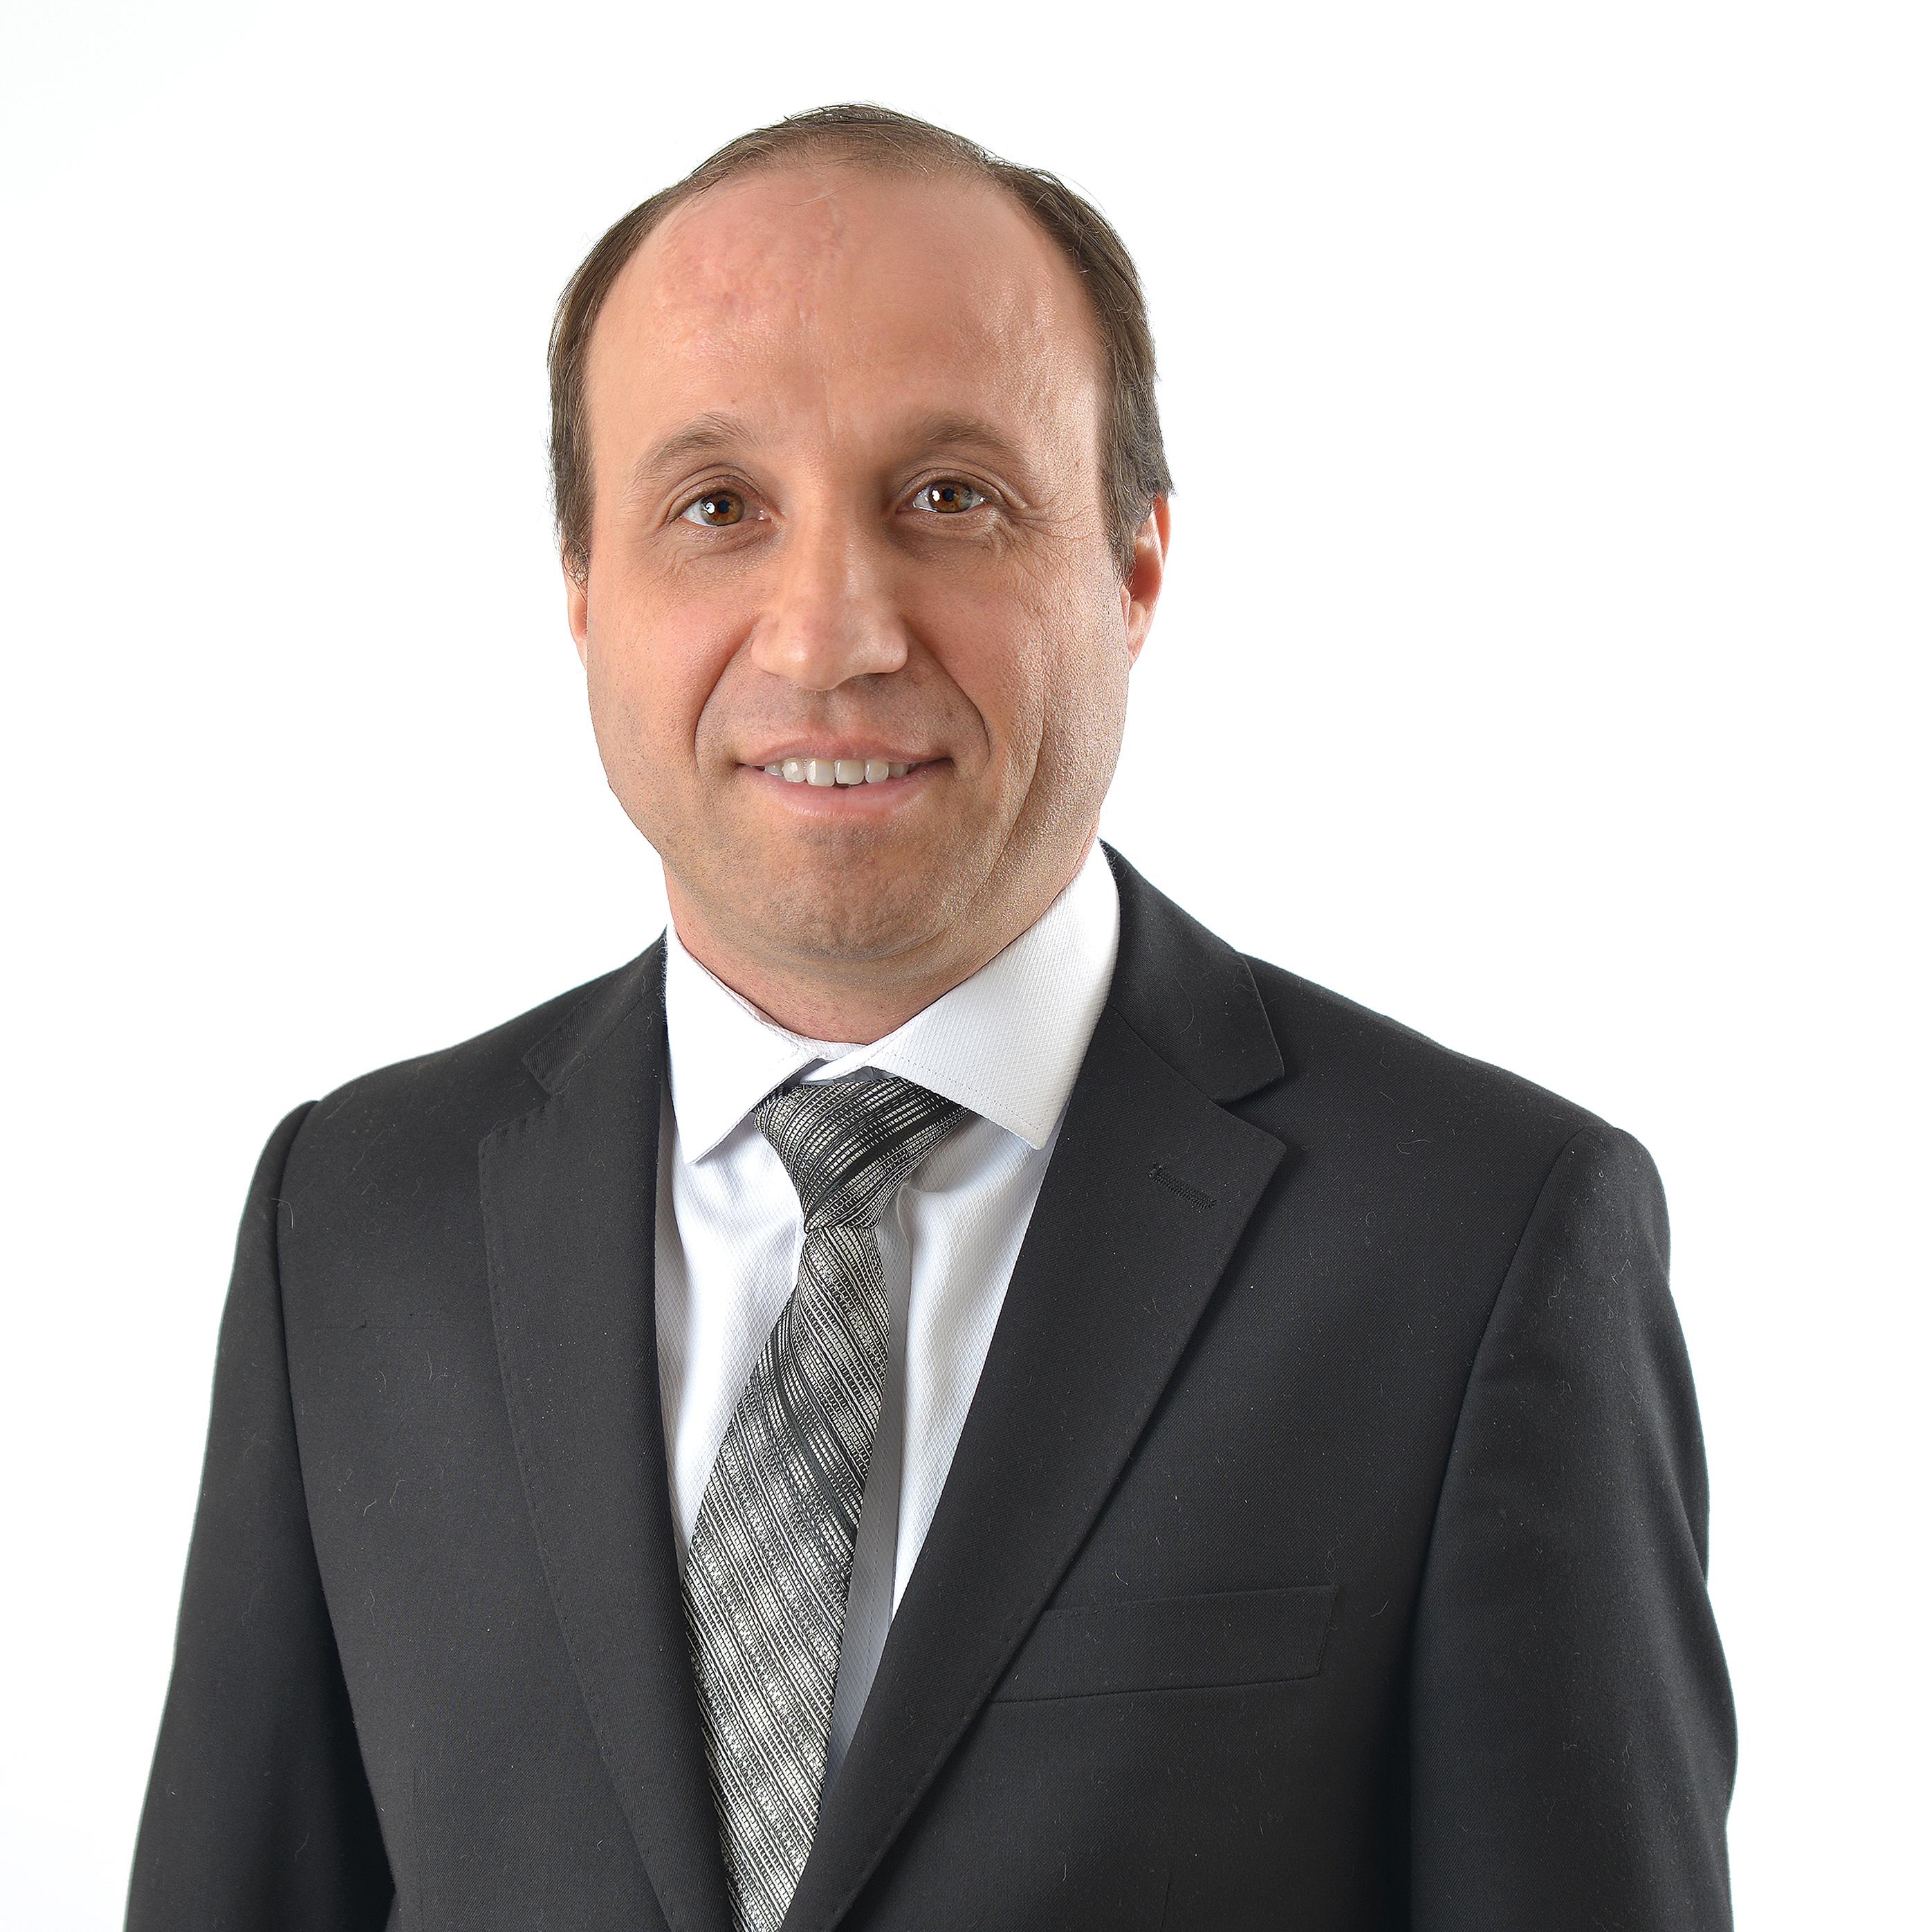 Ricardo Cypriano